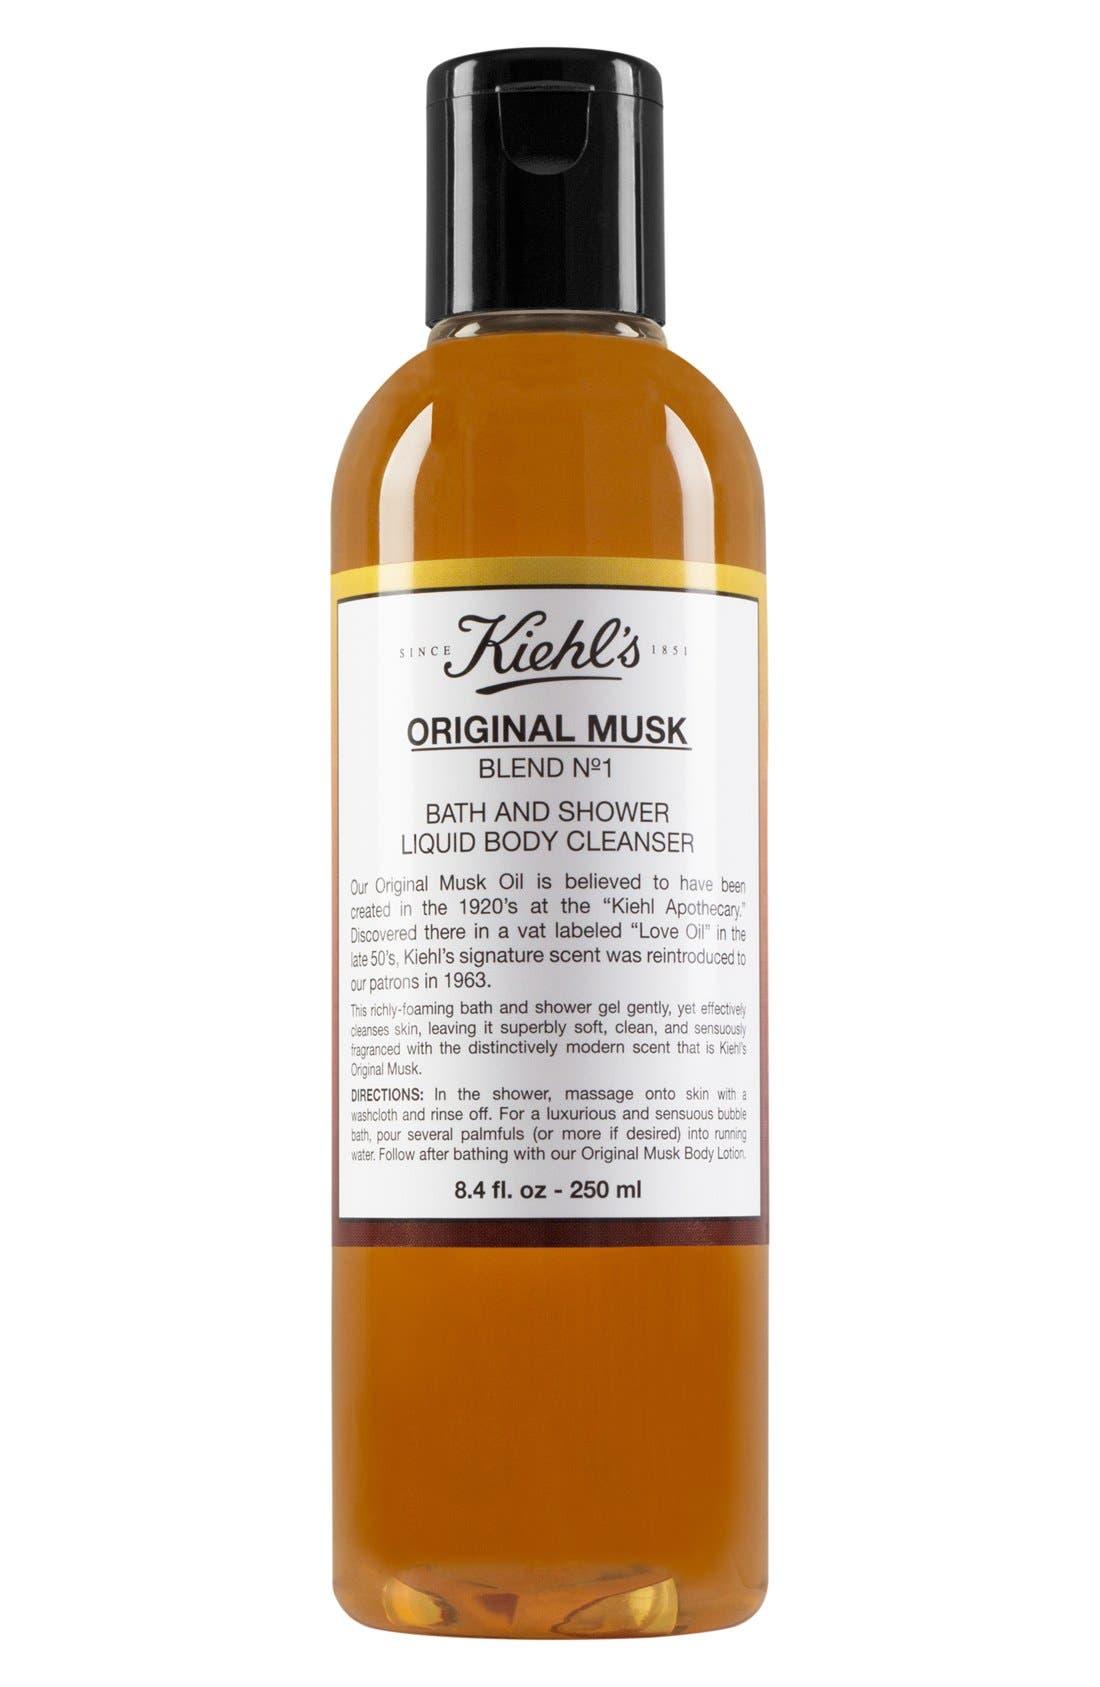 1851 Original Musk Bath & Shower Liquid Body Cleanser